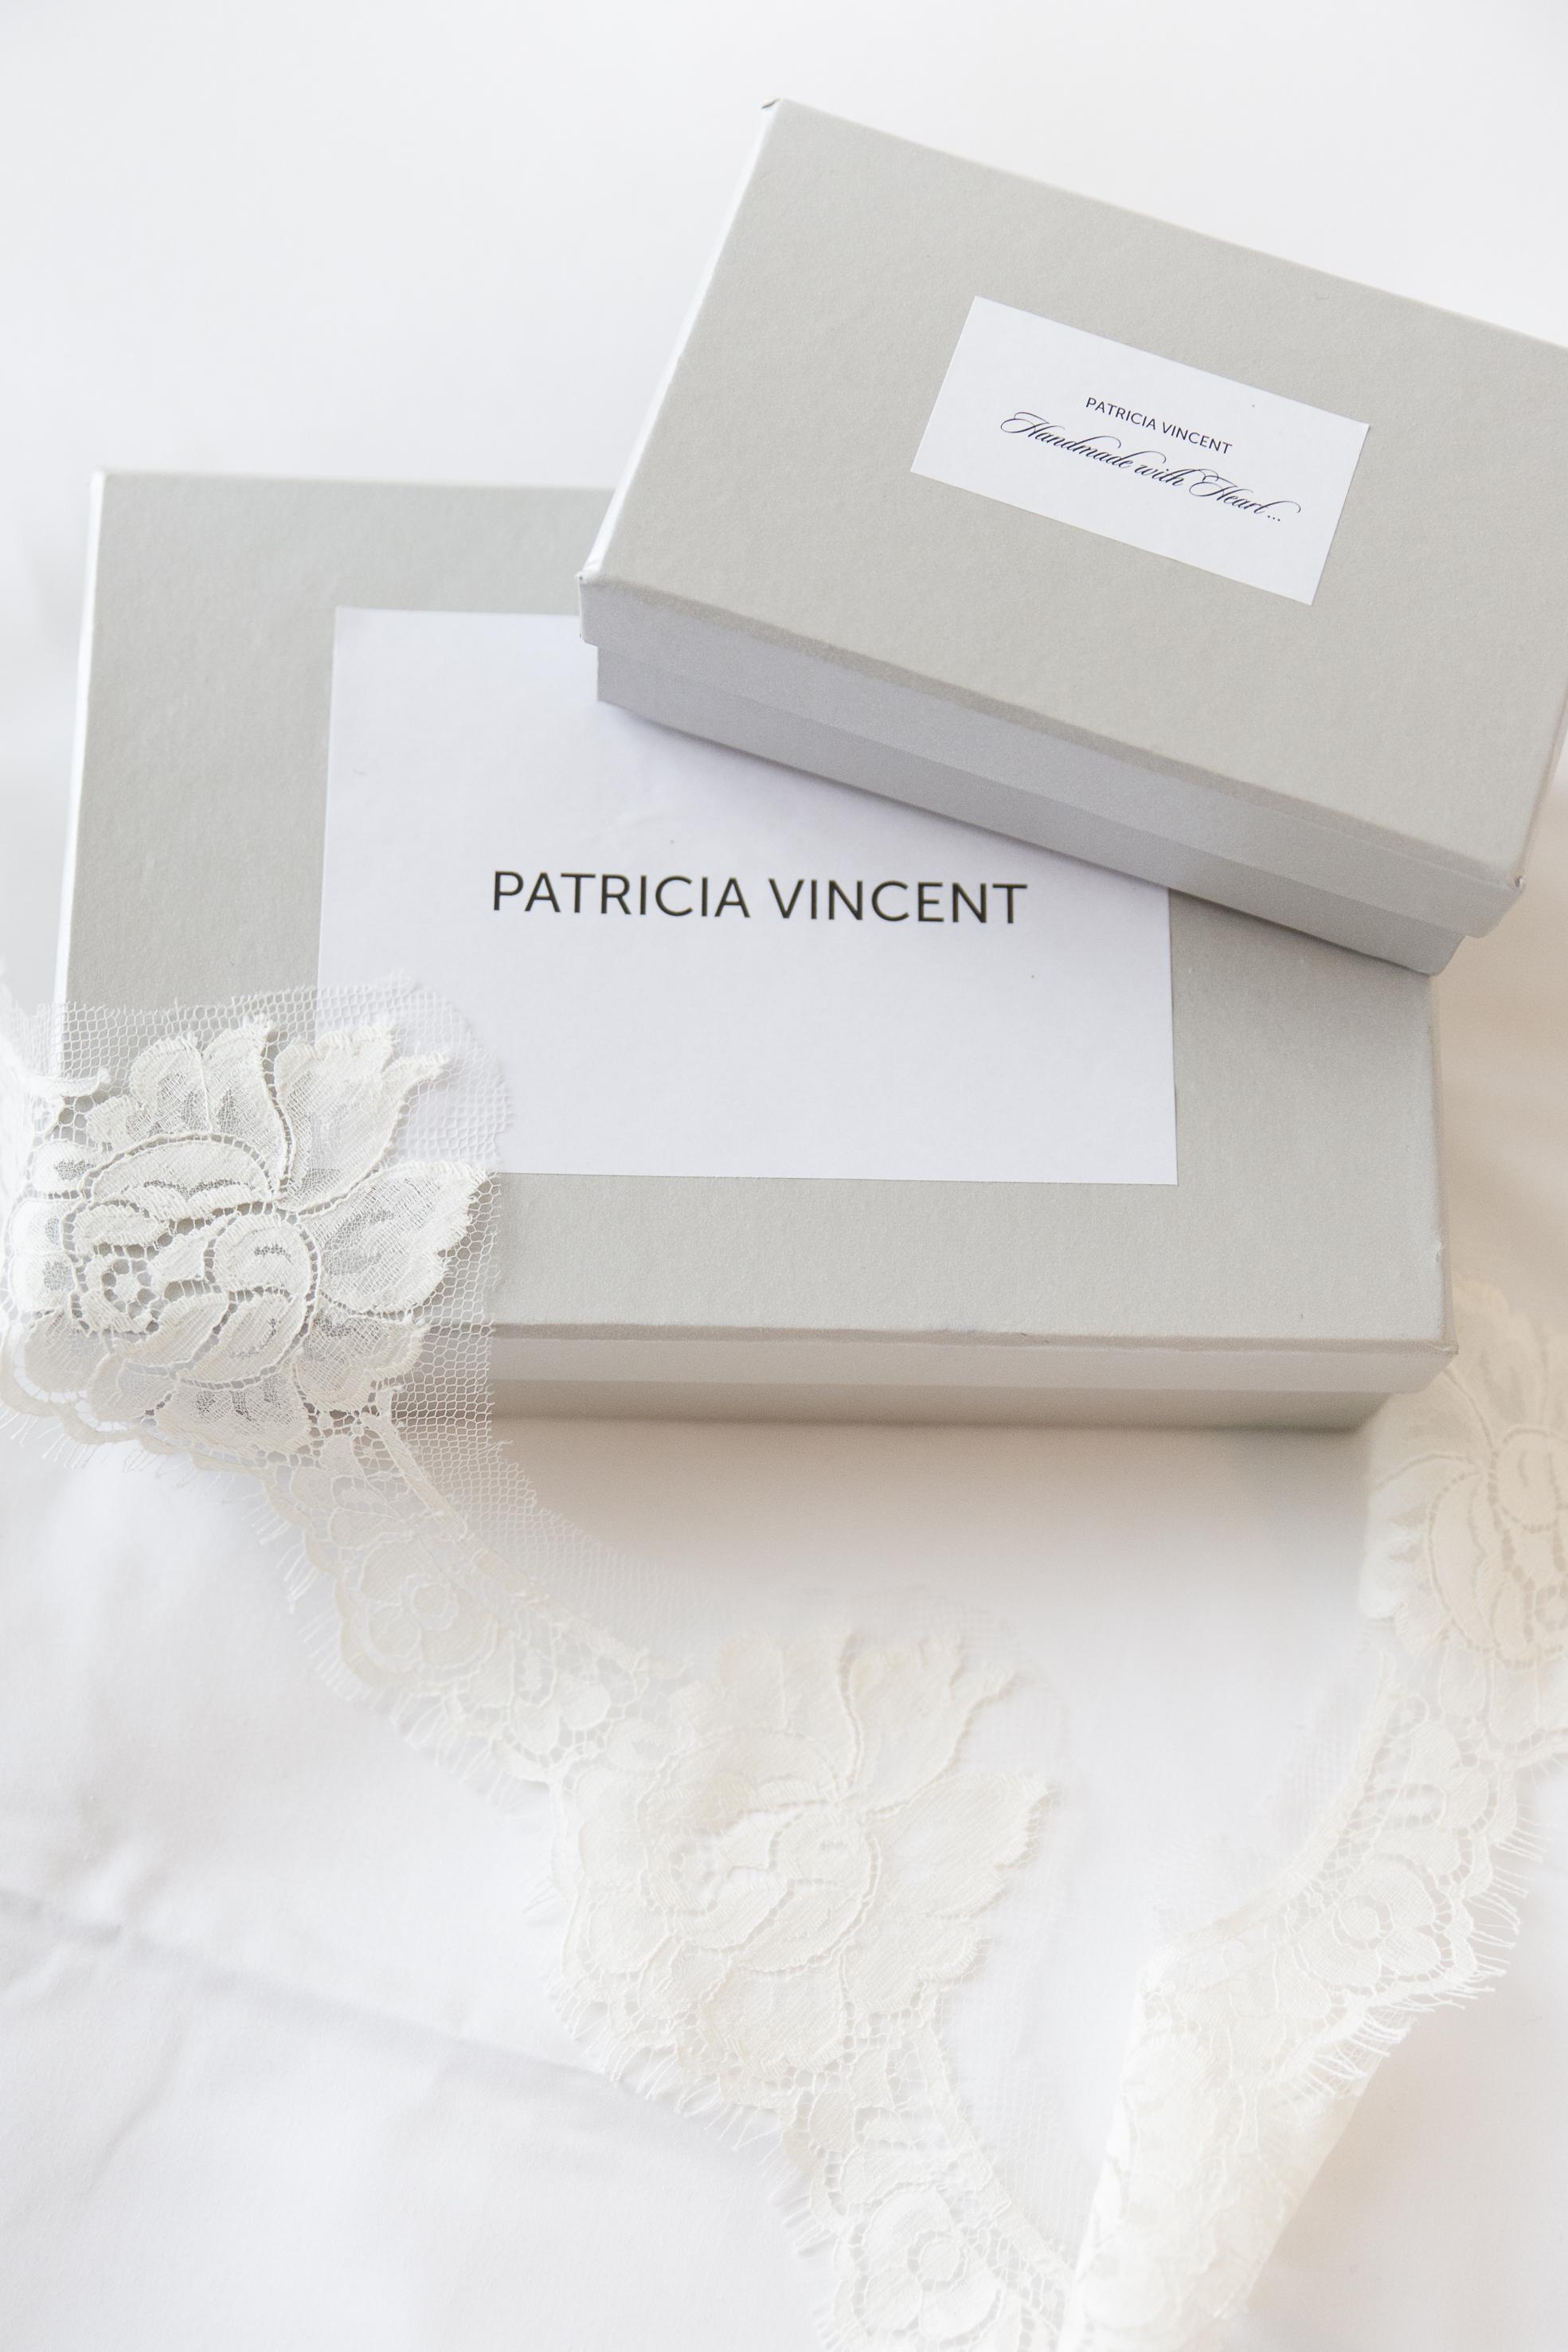 2015.03.31.Shooting_Paticia_Vincent_dress_print-427.jpg